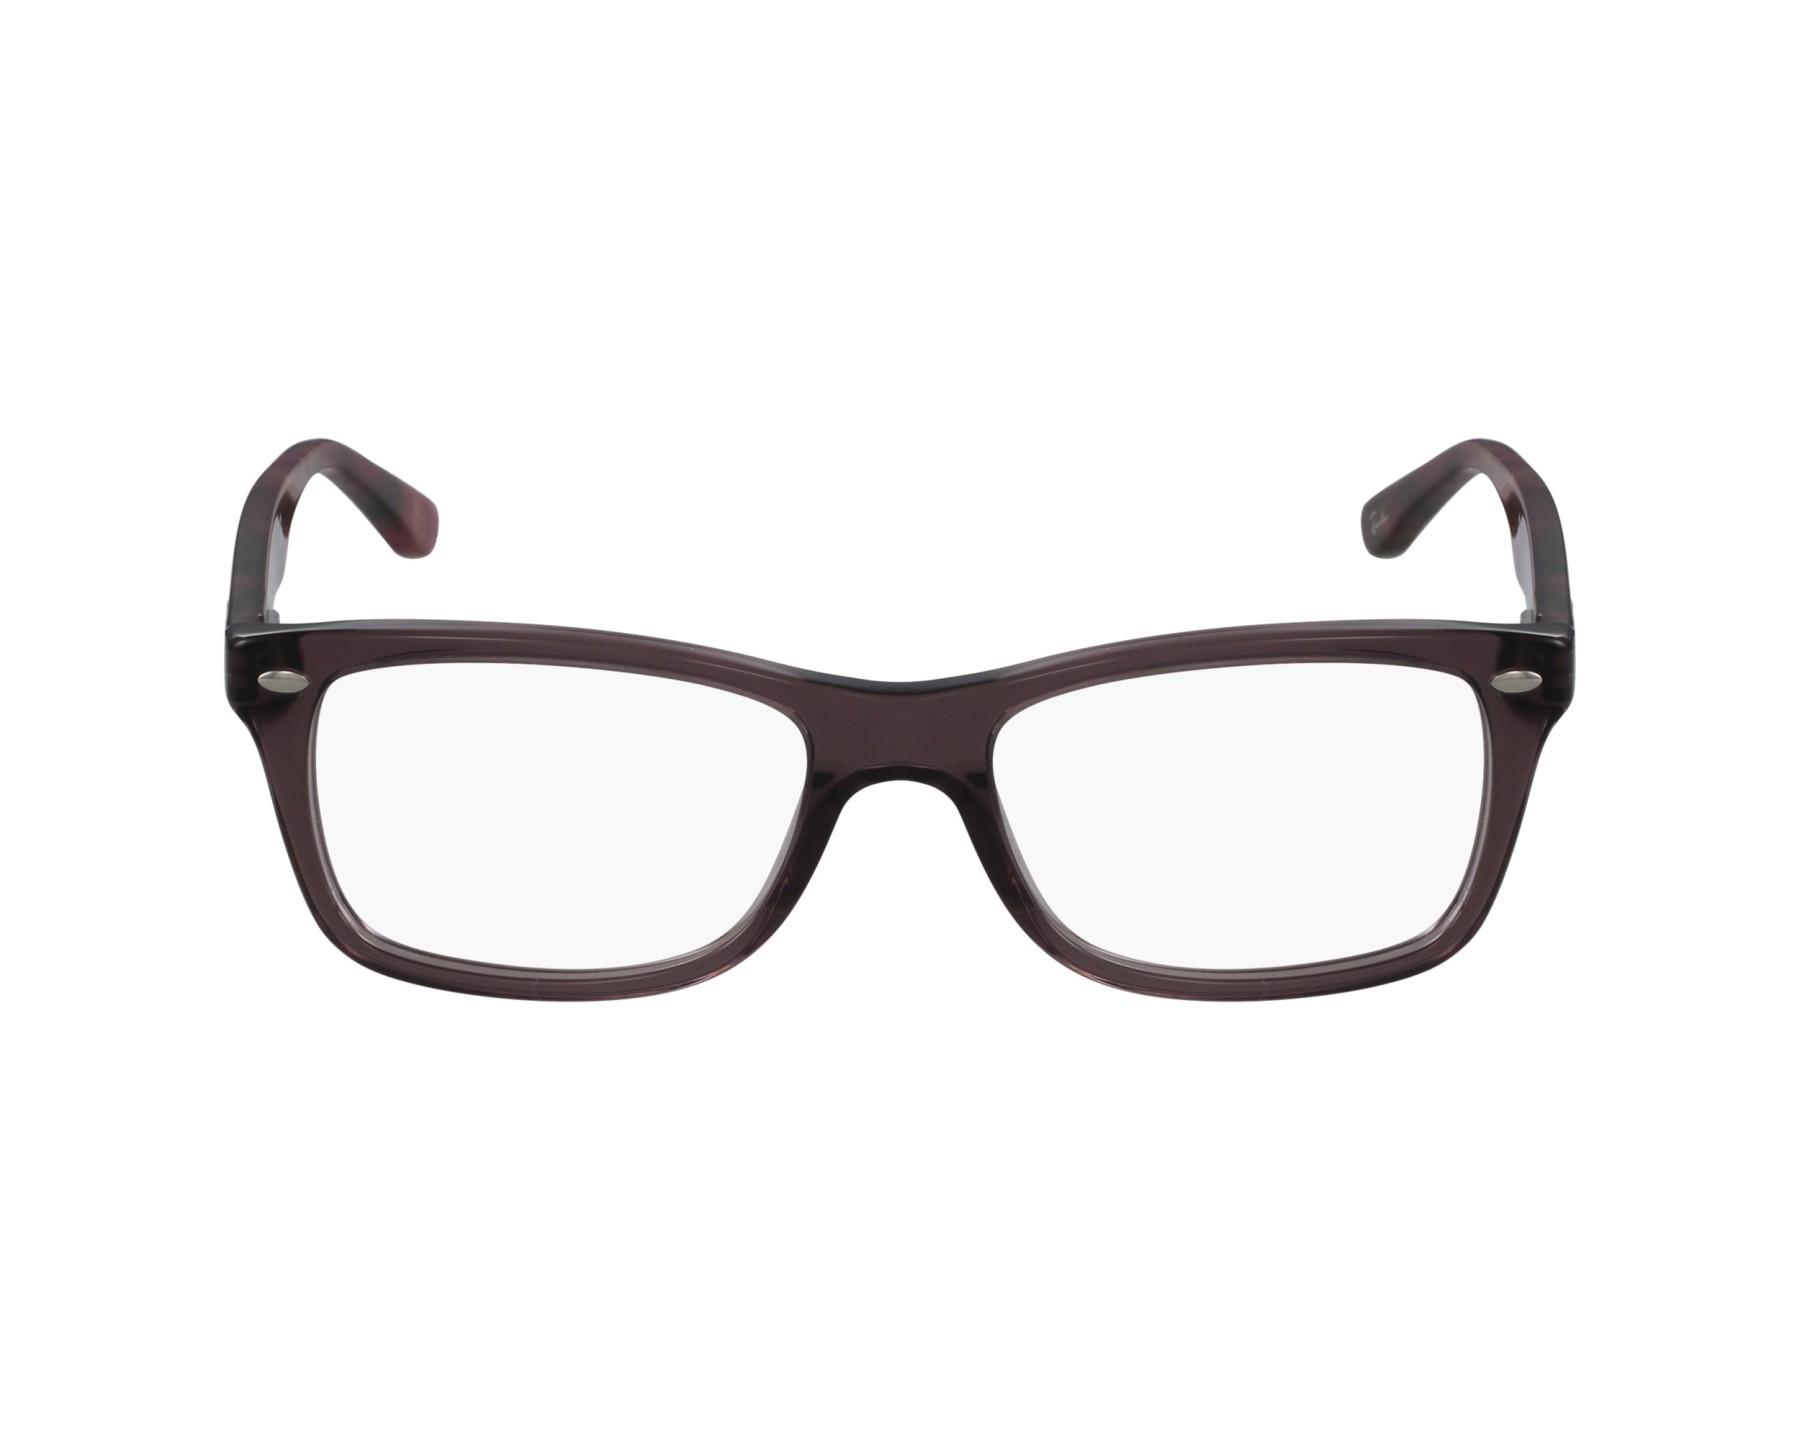 dd2156a6e5 eyeglasses Ray-Ban RX-5228 5628 50-17 Plum profile view